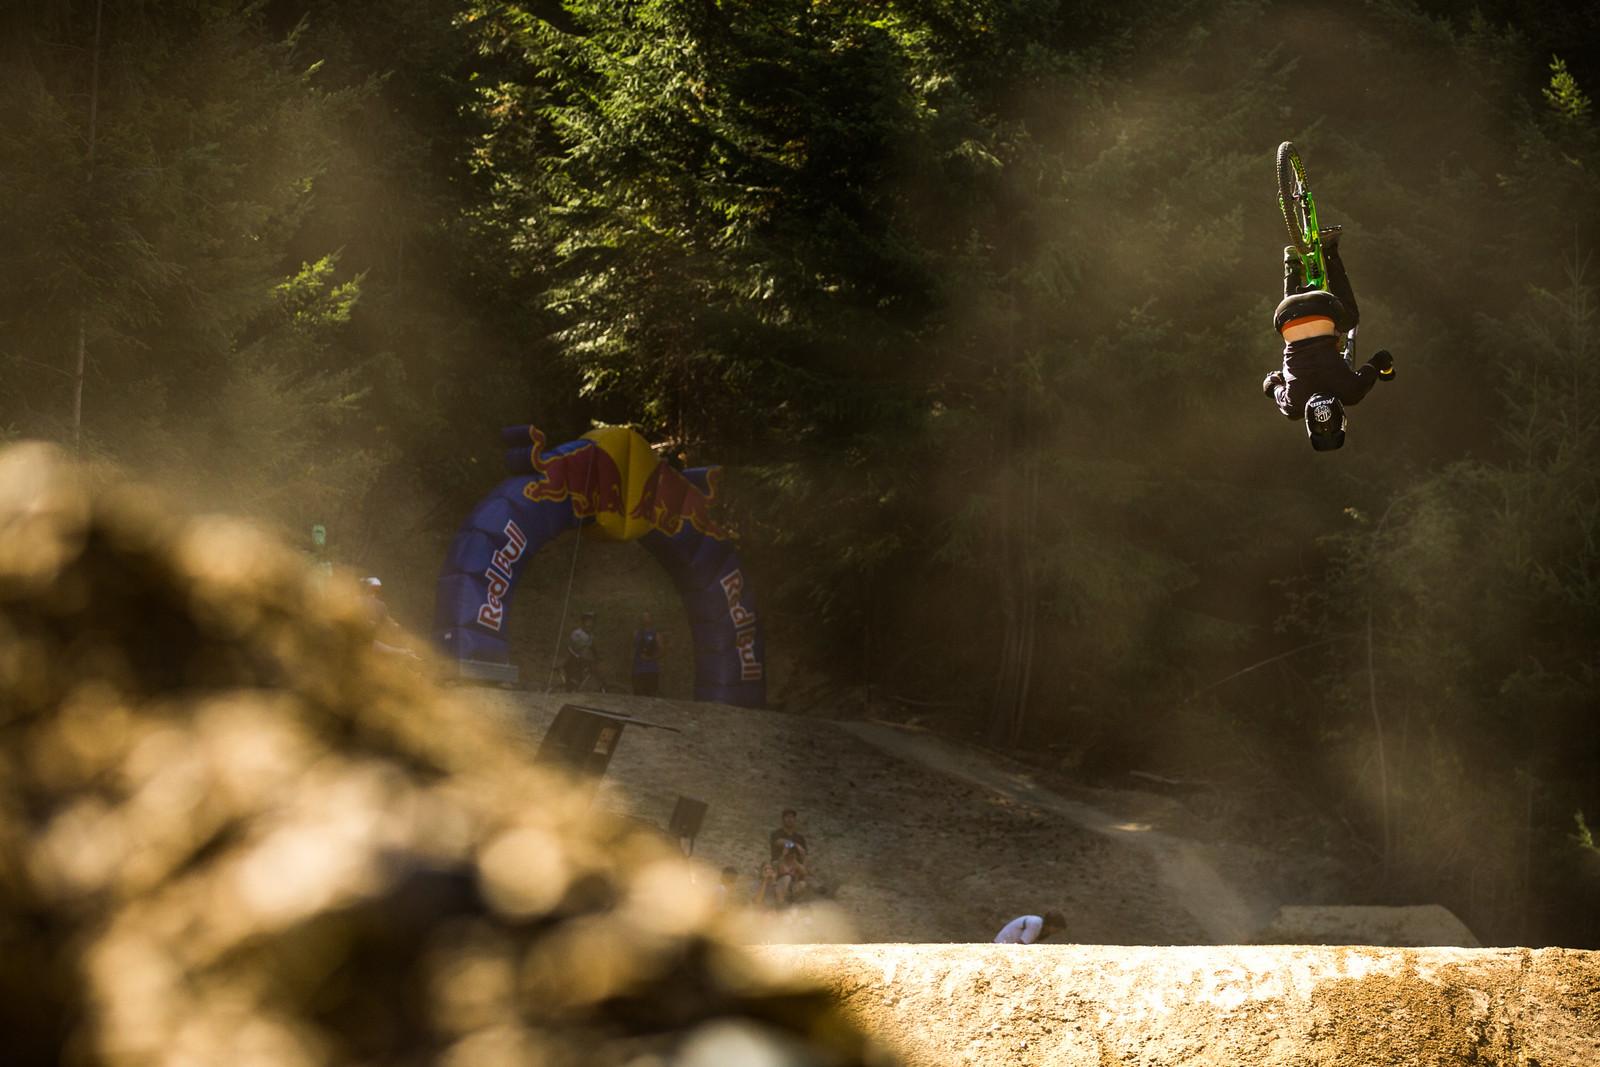 Conor MacFarlane - McGazza Fest Dream Track Jam - Mountain Biking Pictures - Vital MTB